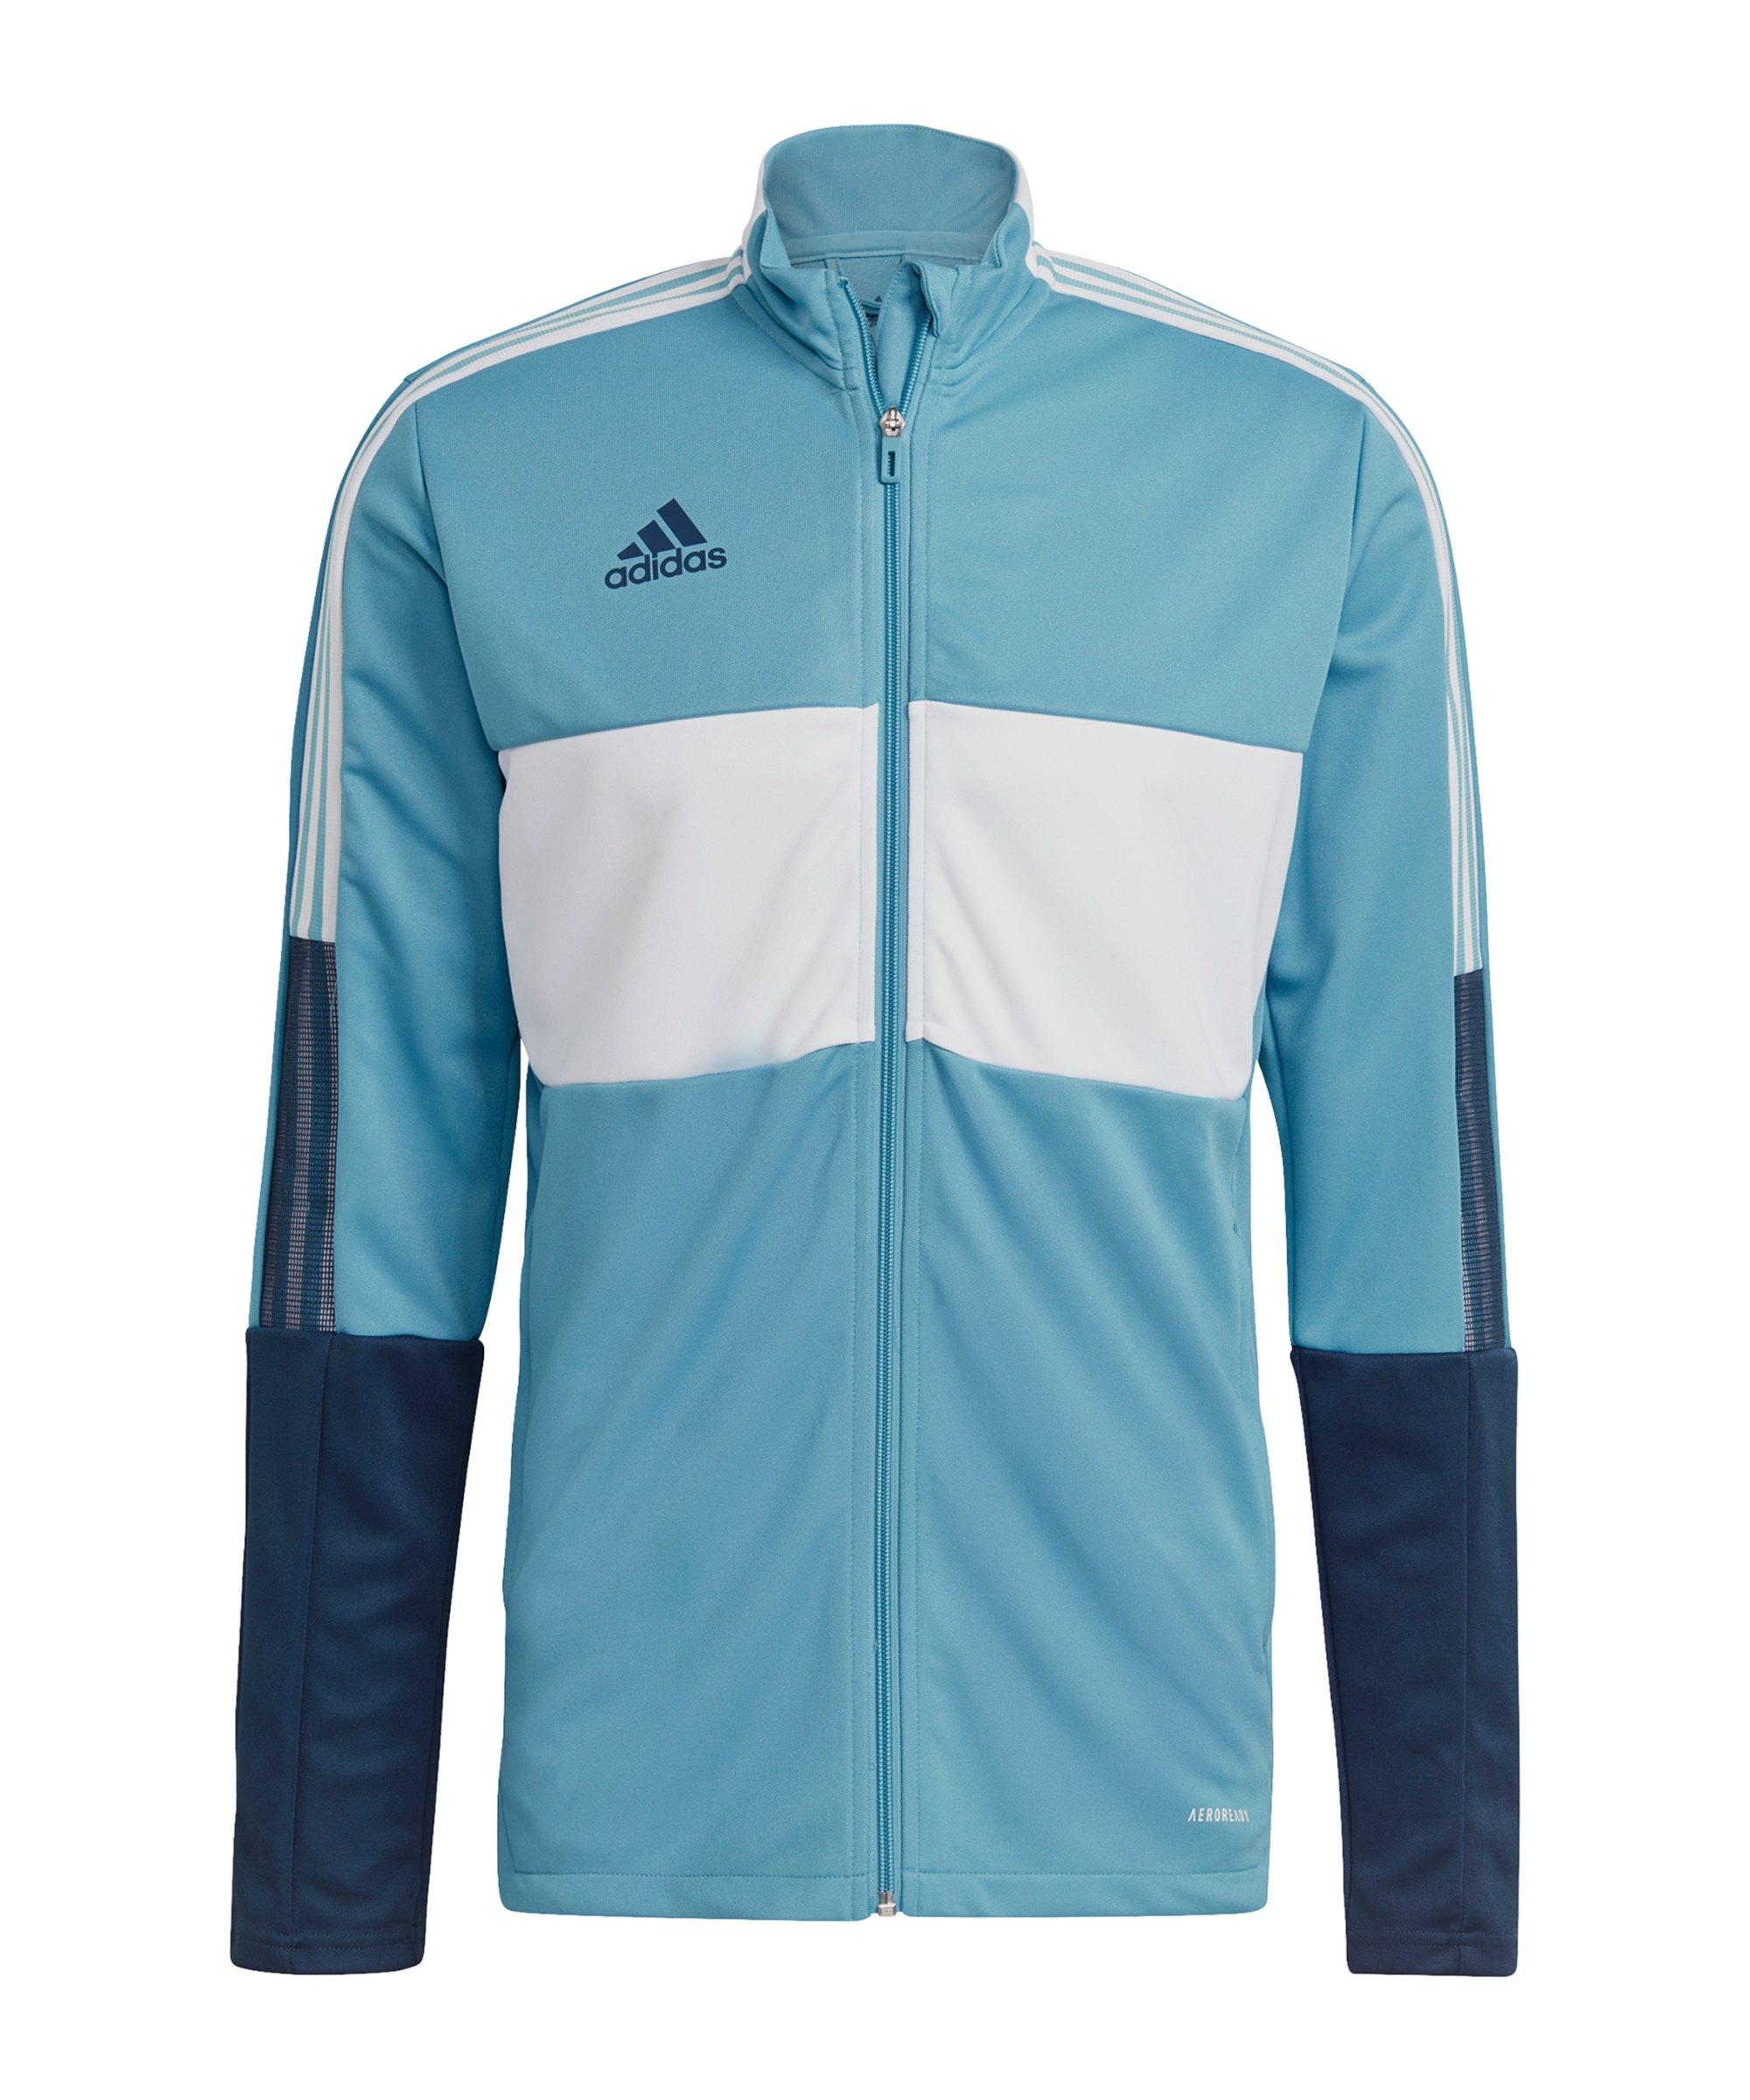 adidas Tiro Trainingsjacke Blau Weiss - blau